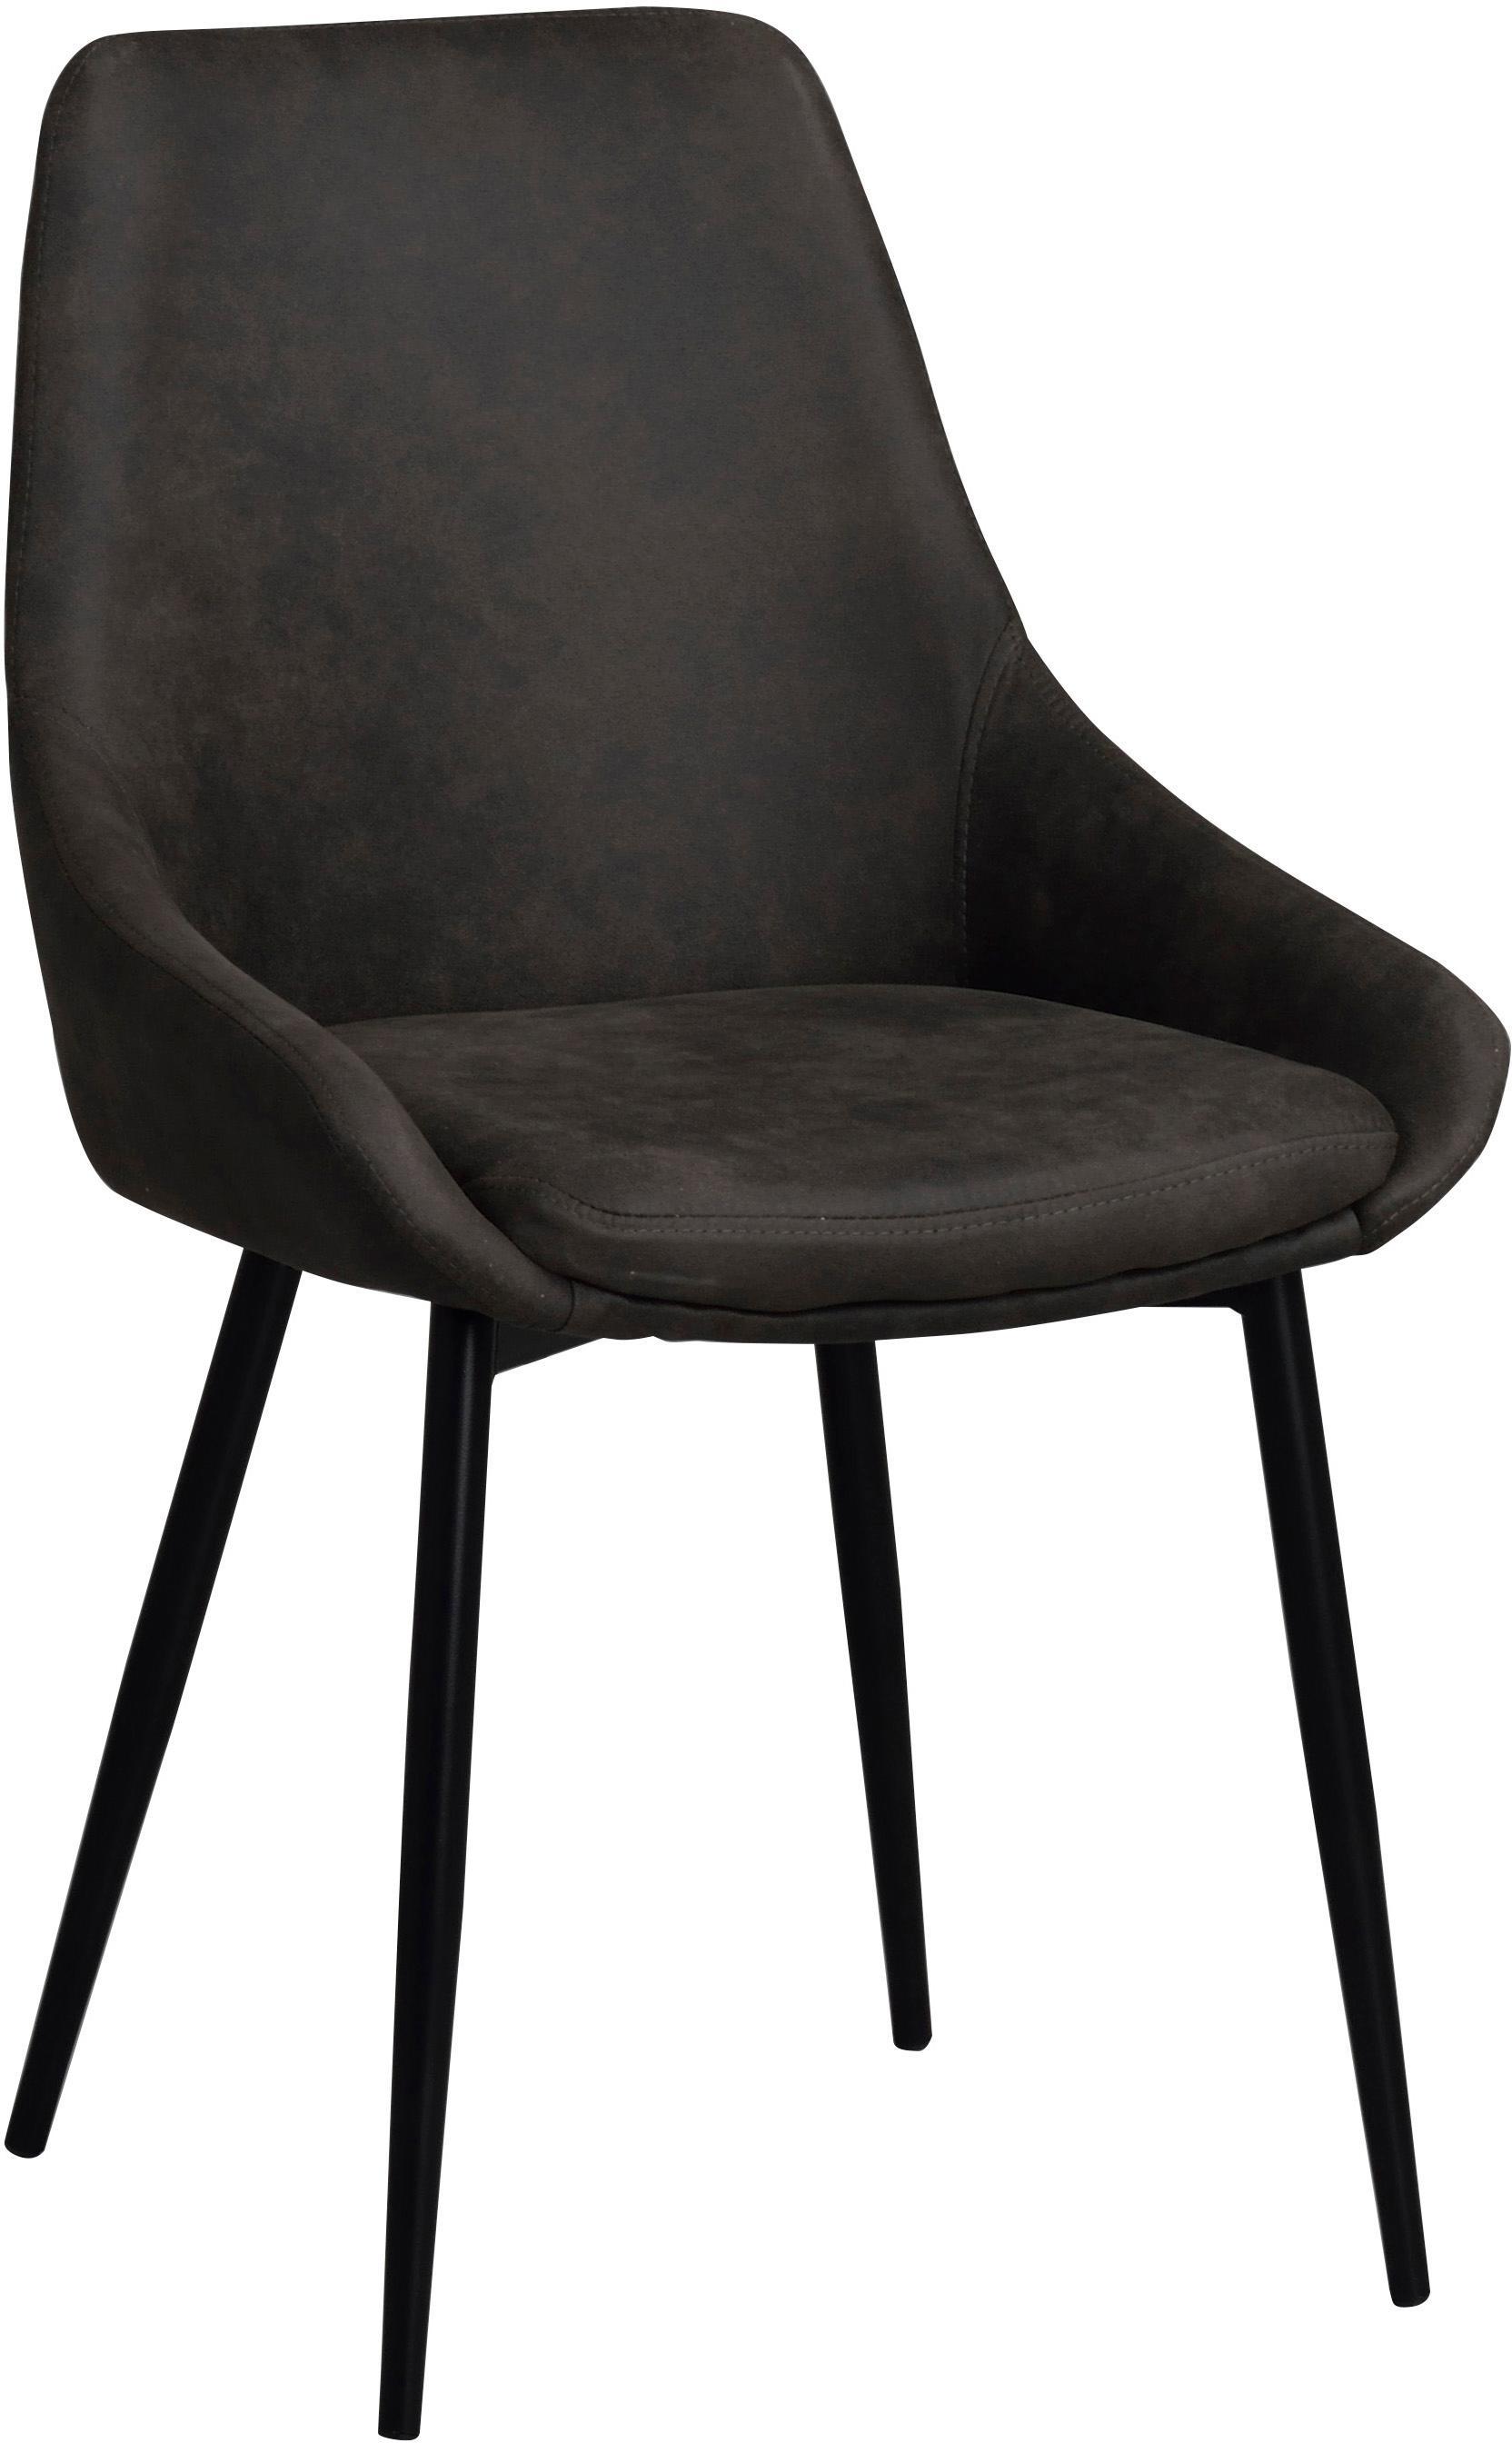 Polsterstühle Sierra, 2 Stück, Bezug: Polyester in Wildleder-Op, Beine: Metall, lackiert, Dunkelgrau, B 49 x T 55 cm